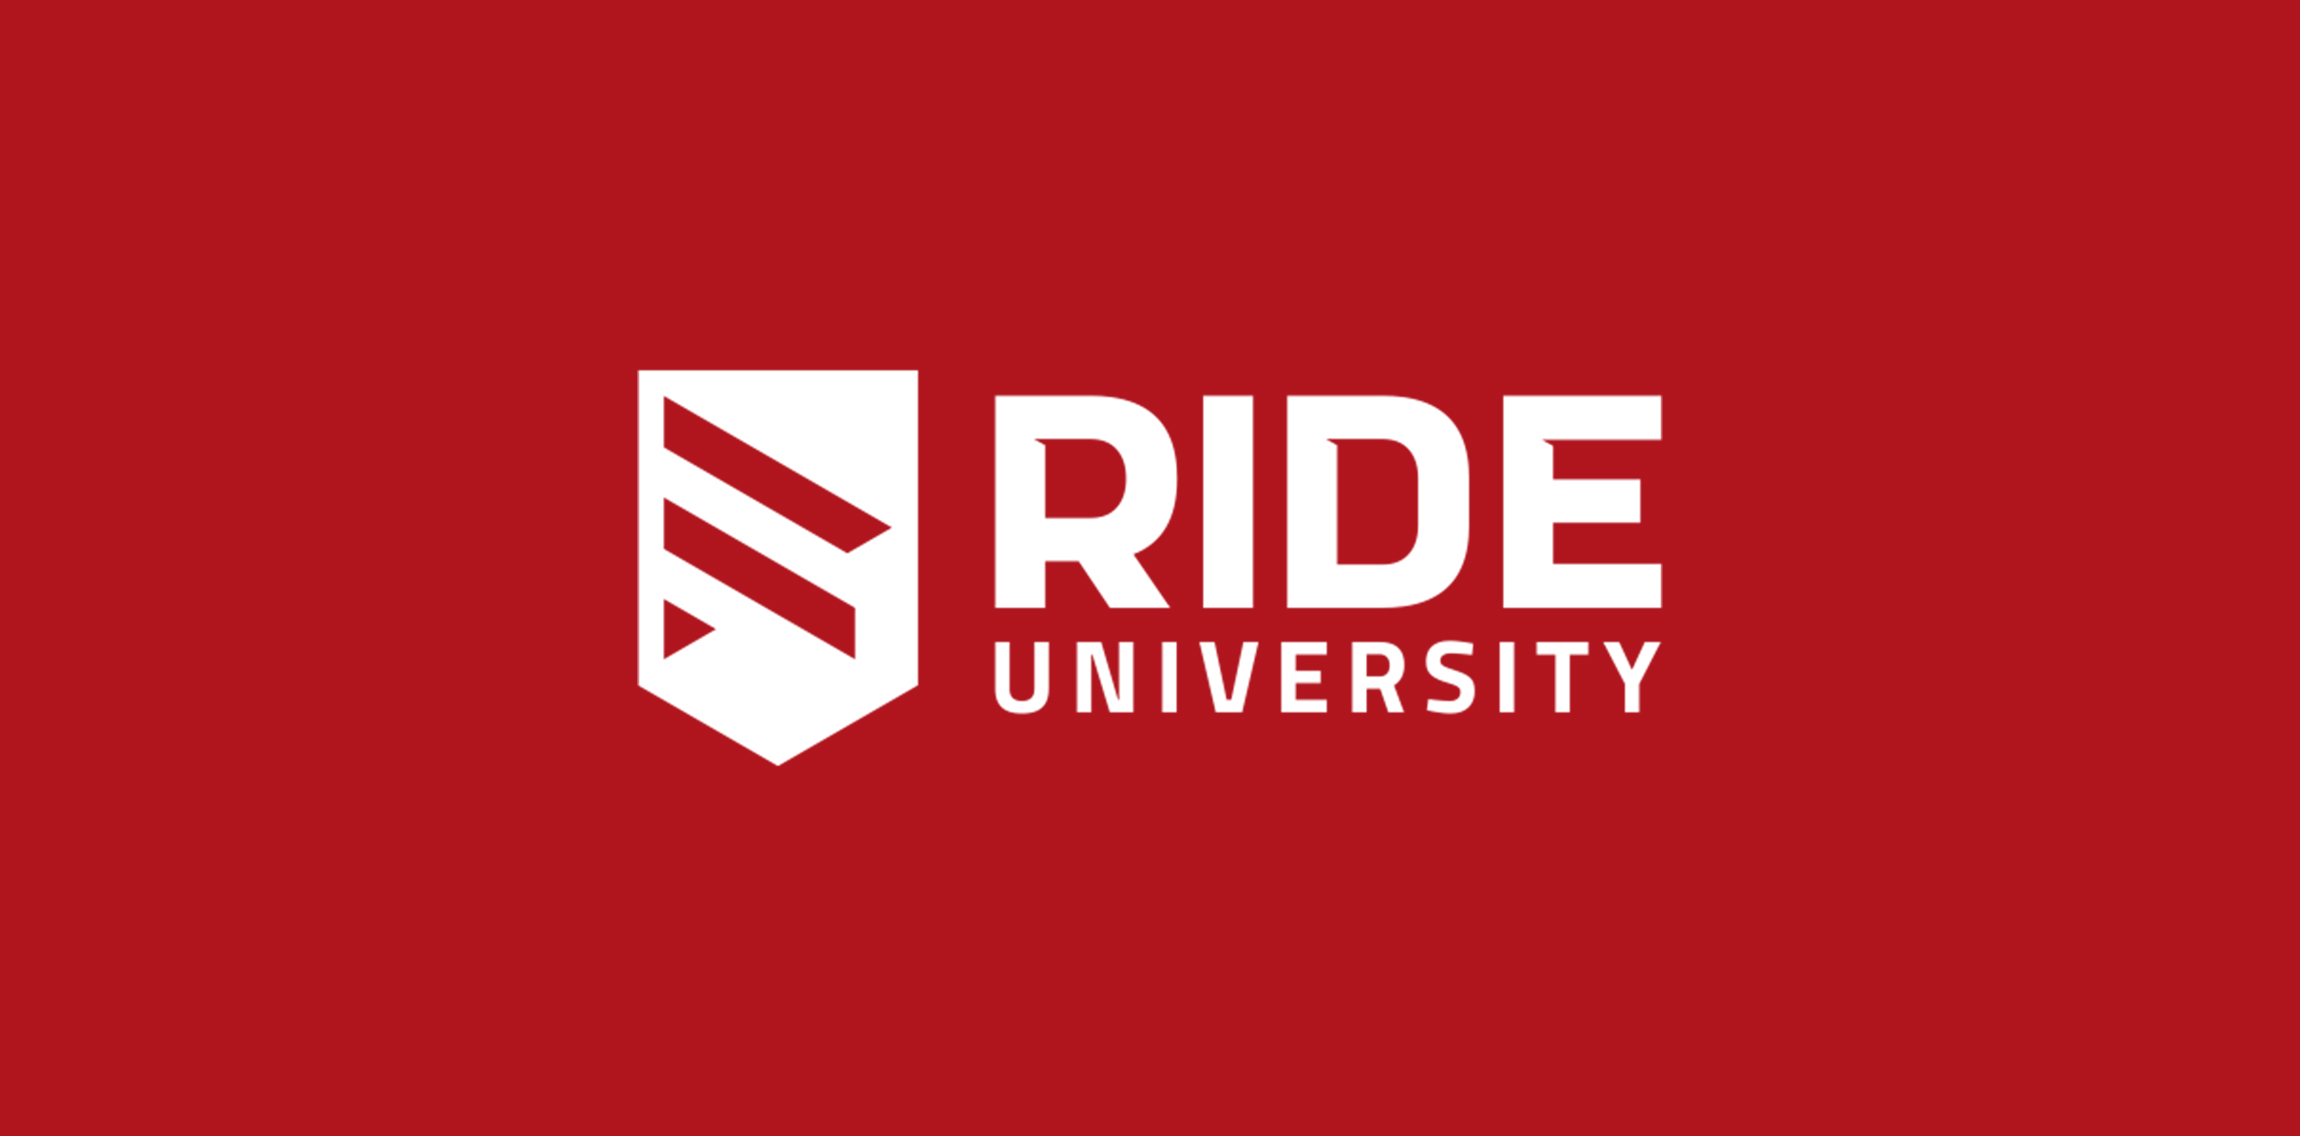 RIDE University